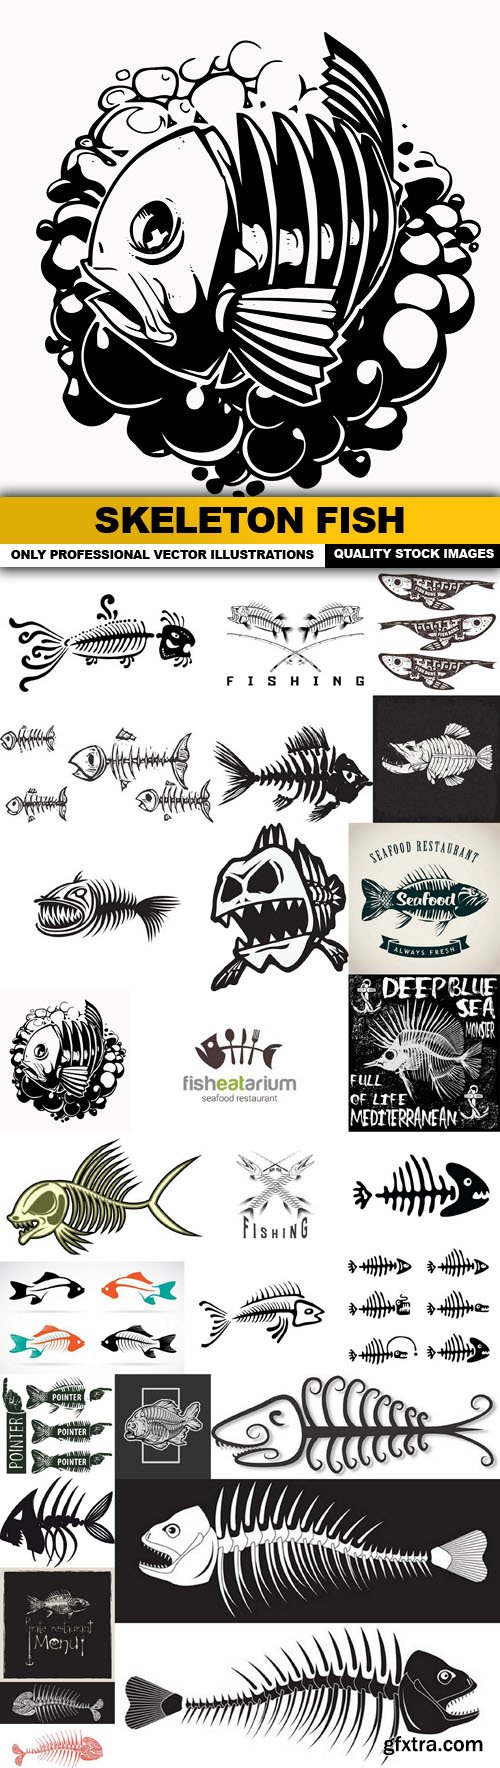 Skeleton Fish Bone Fish - 25 Vector